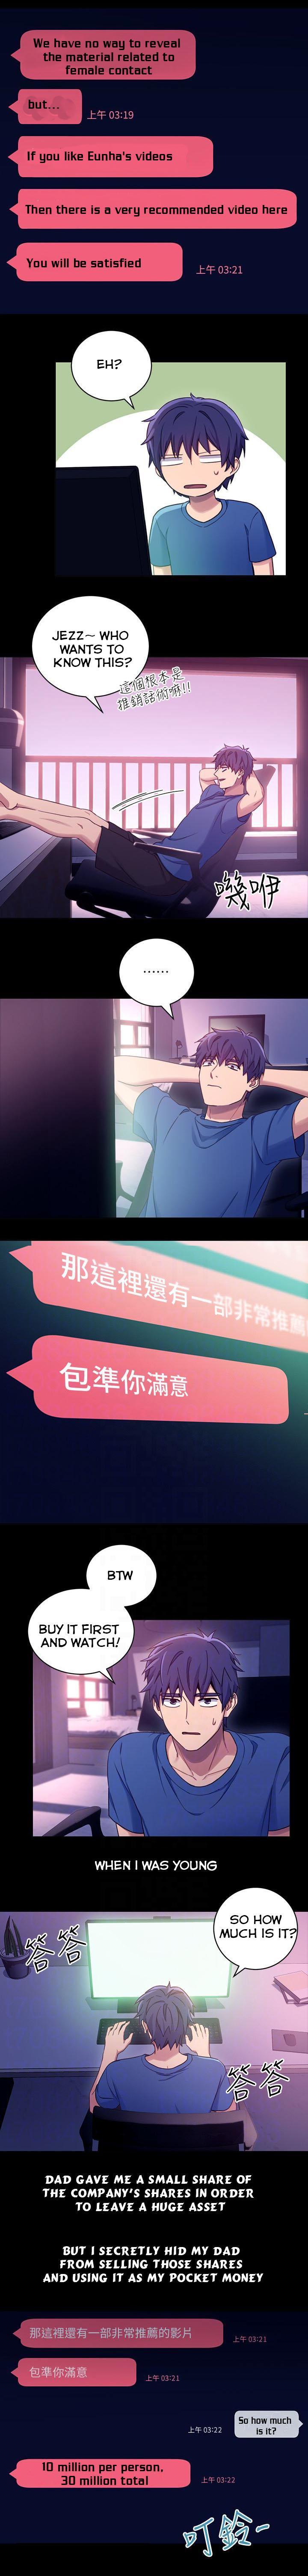 [Neck Pilllow] Stepmother Friends Ch.40/? [English] [Hentai Universe] NEW! 22/10/2020 85